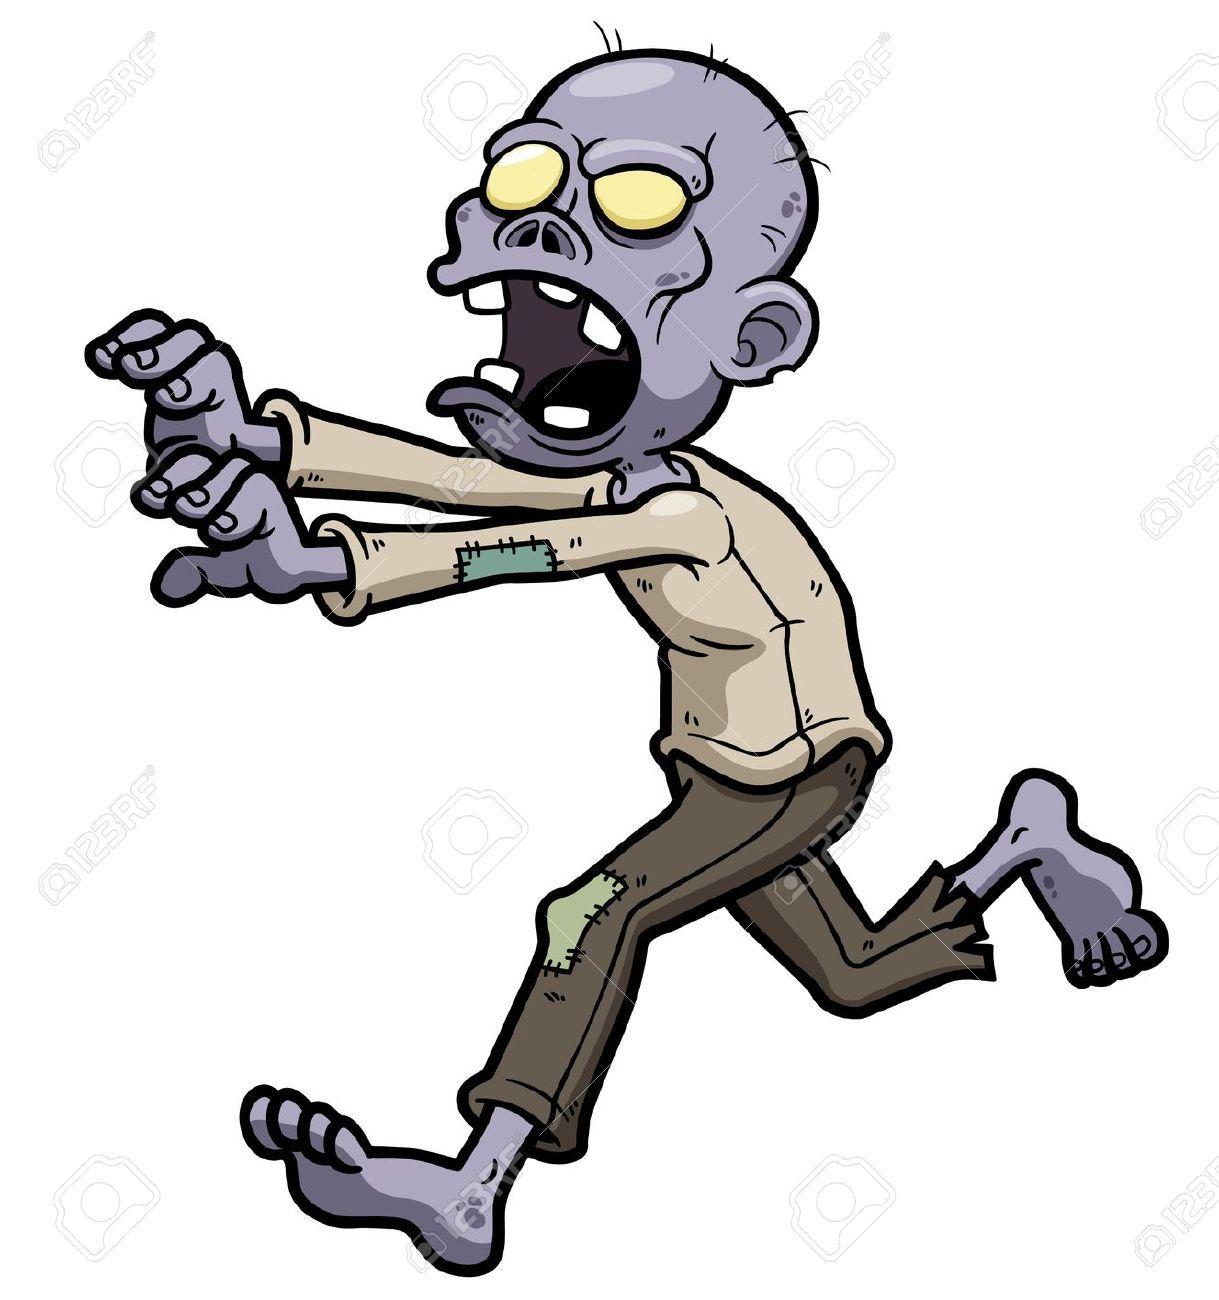 Zombie Cartoon Cliparts Stock Vector And Royalty Free Zombie Cartoon Illustrations Zombie Cartoon Zombie Illustration Cartoon